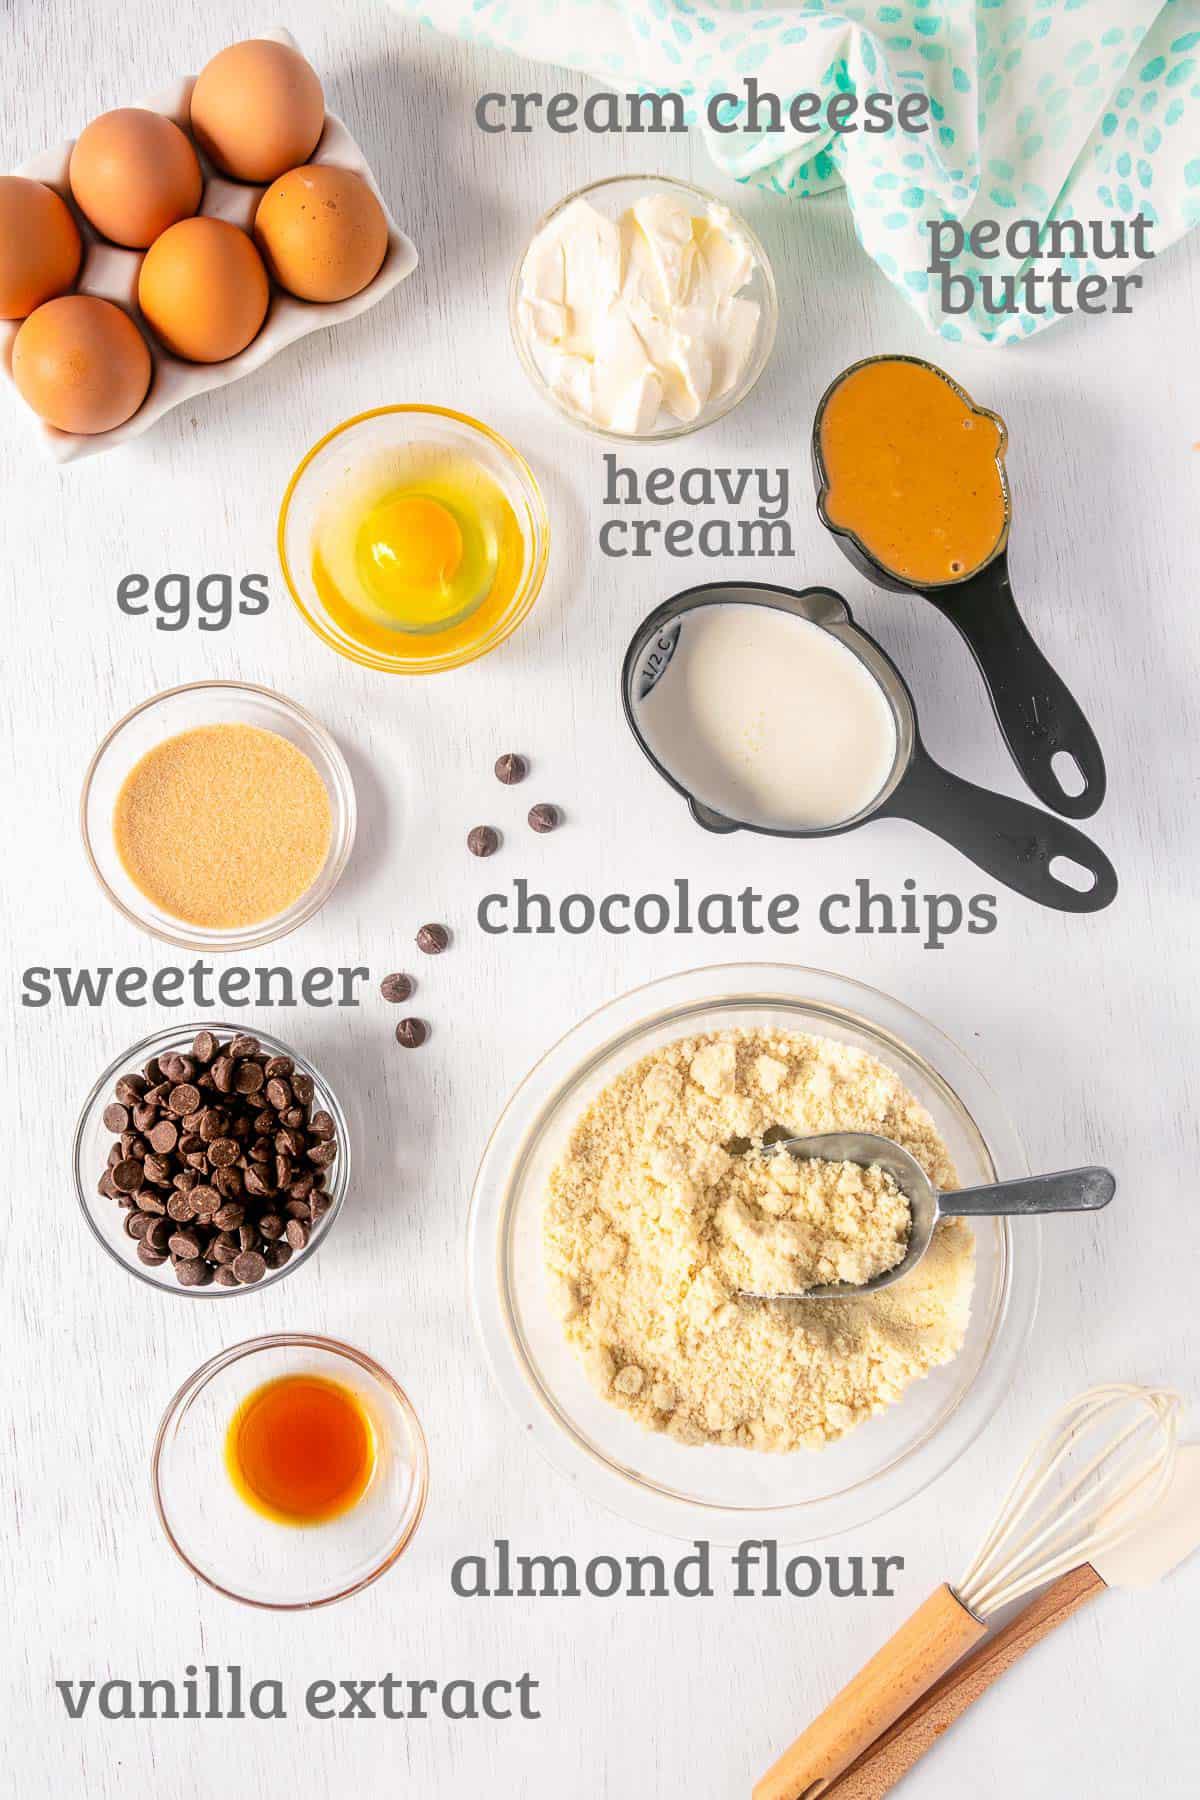 Ingredients for gluten free chocolate peanut butter bars - almond flour, peanut butter, chocolate chips